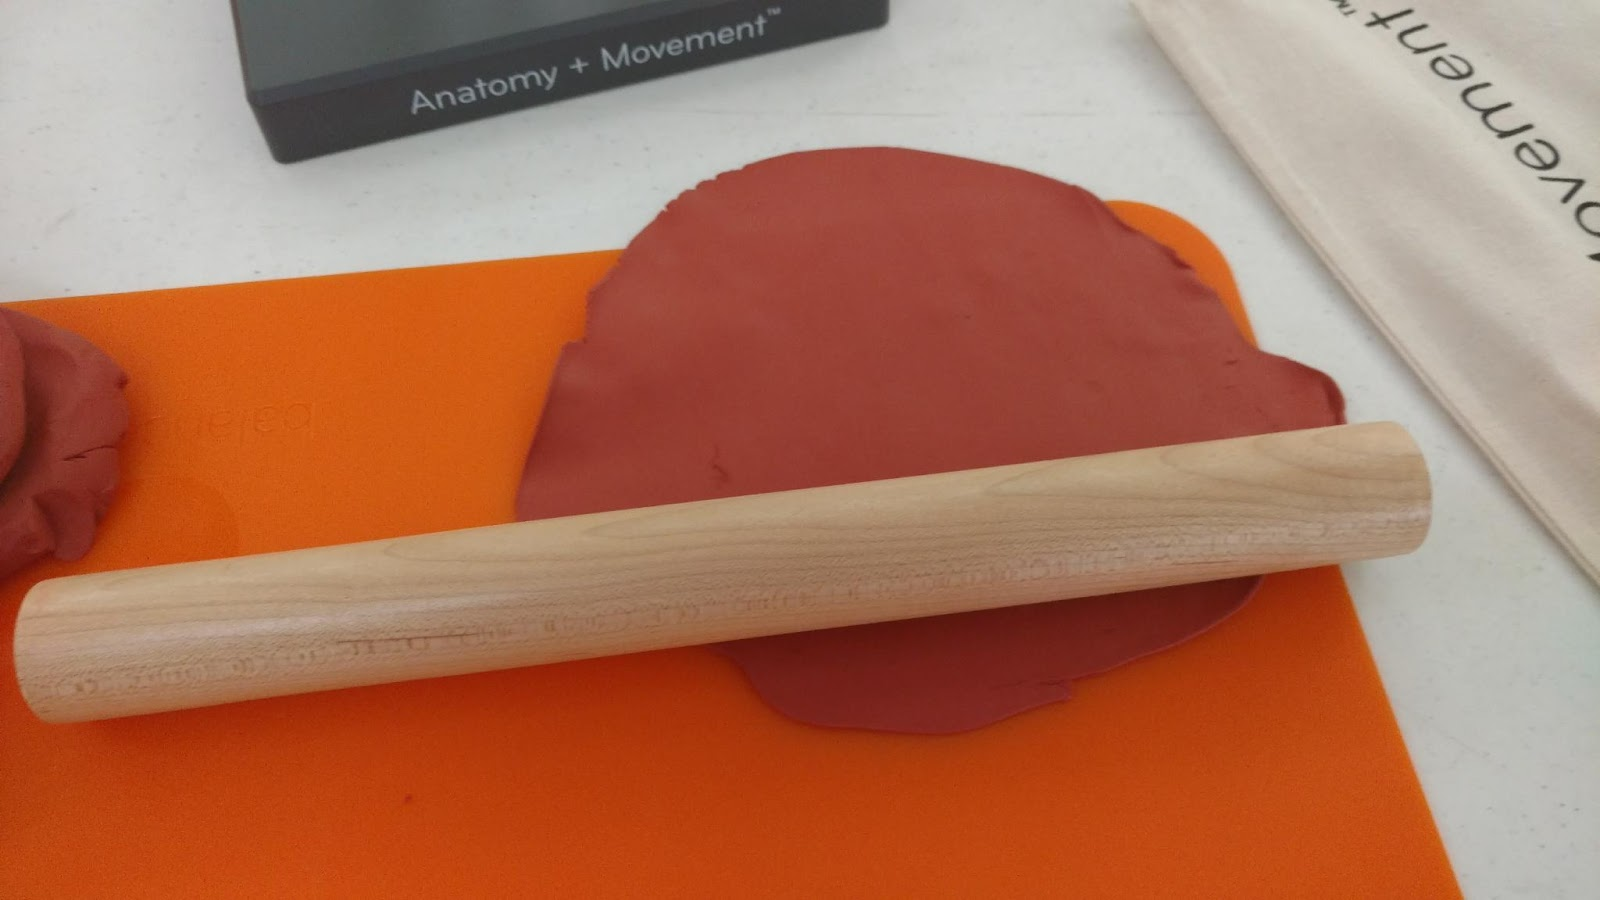 The Burrow: Anatomy in Clay